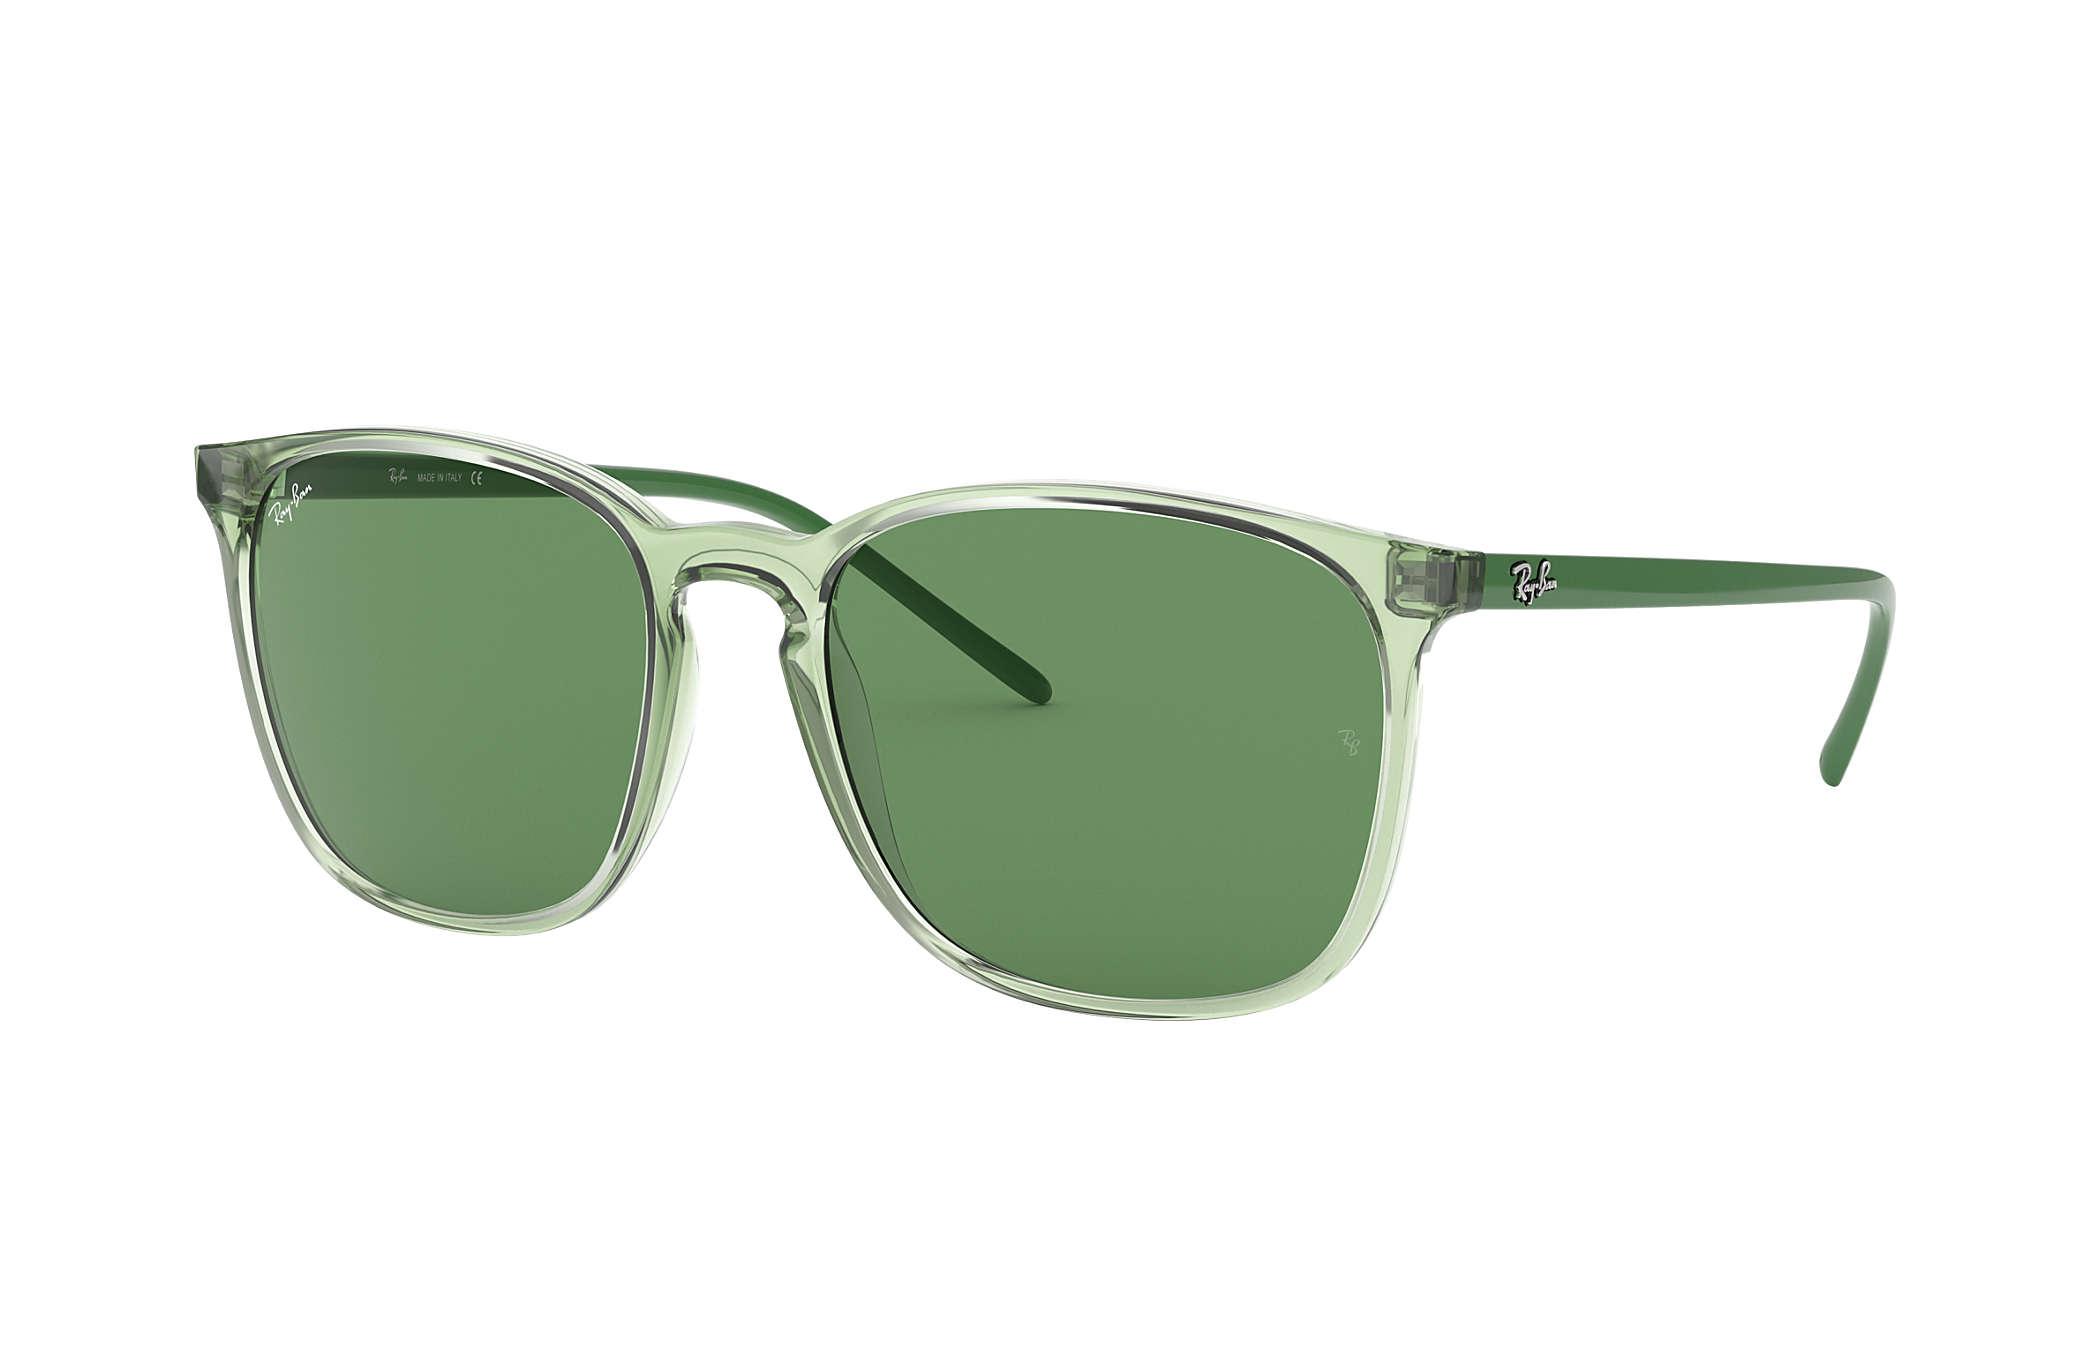 d0d19f545 Ray-Ban Rb4387 RB4387 Verde - Nylon - Lentes Verde 0RB43876402/256 ...